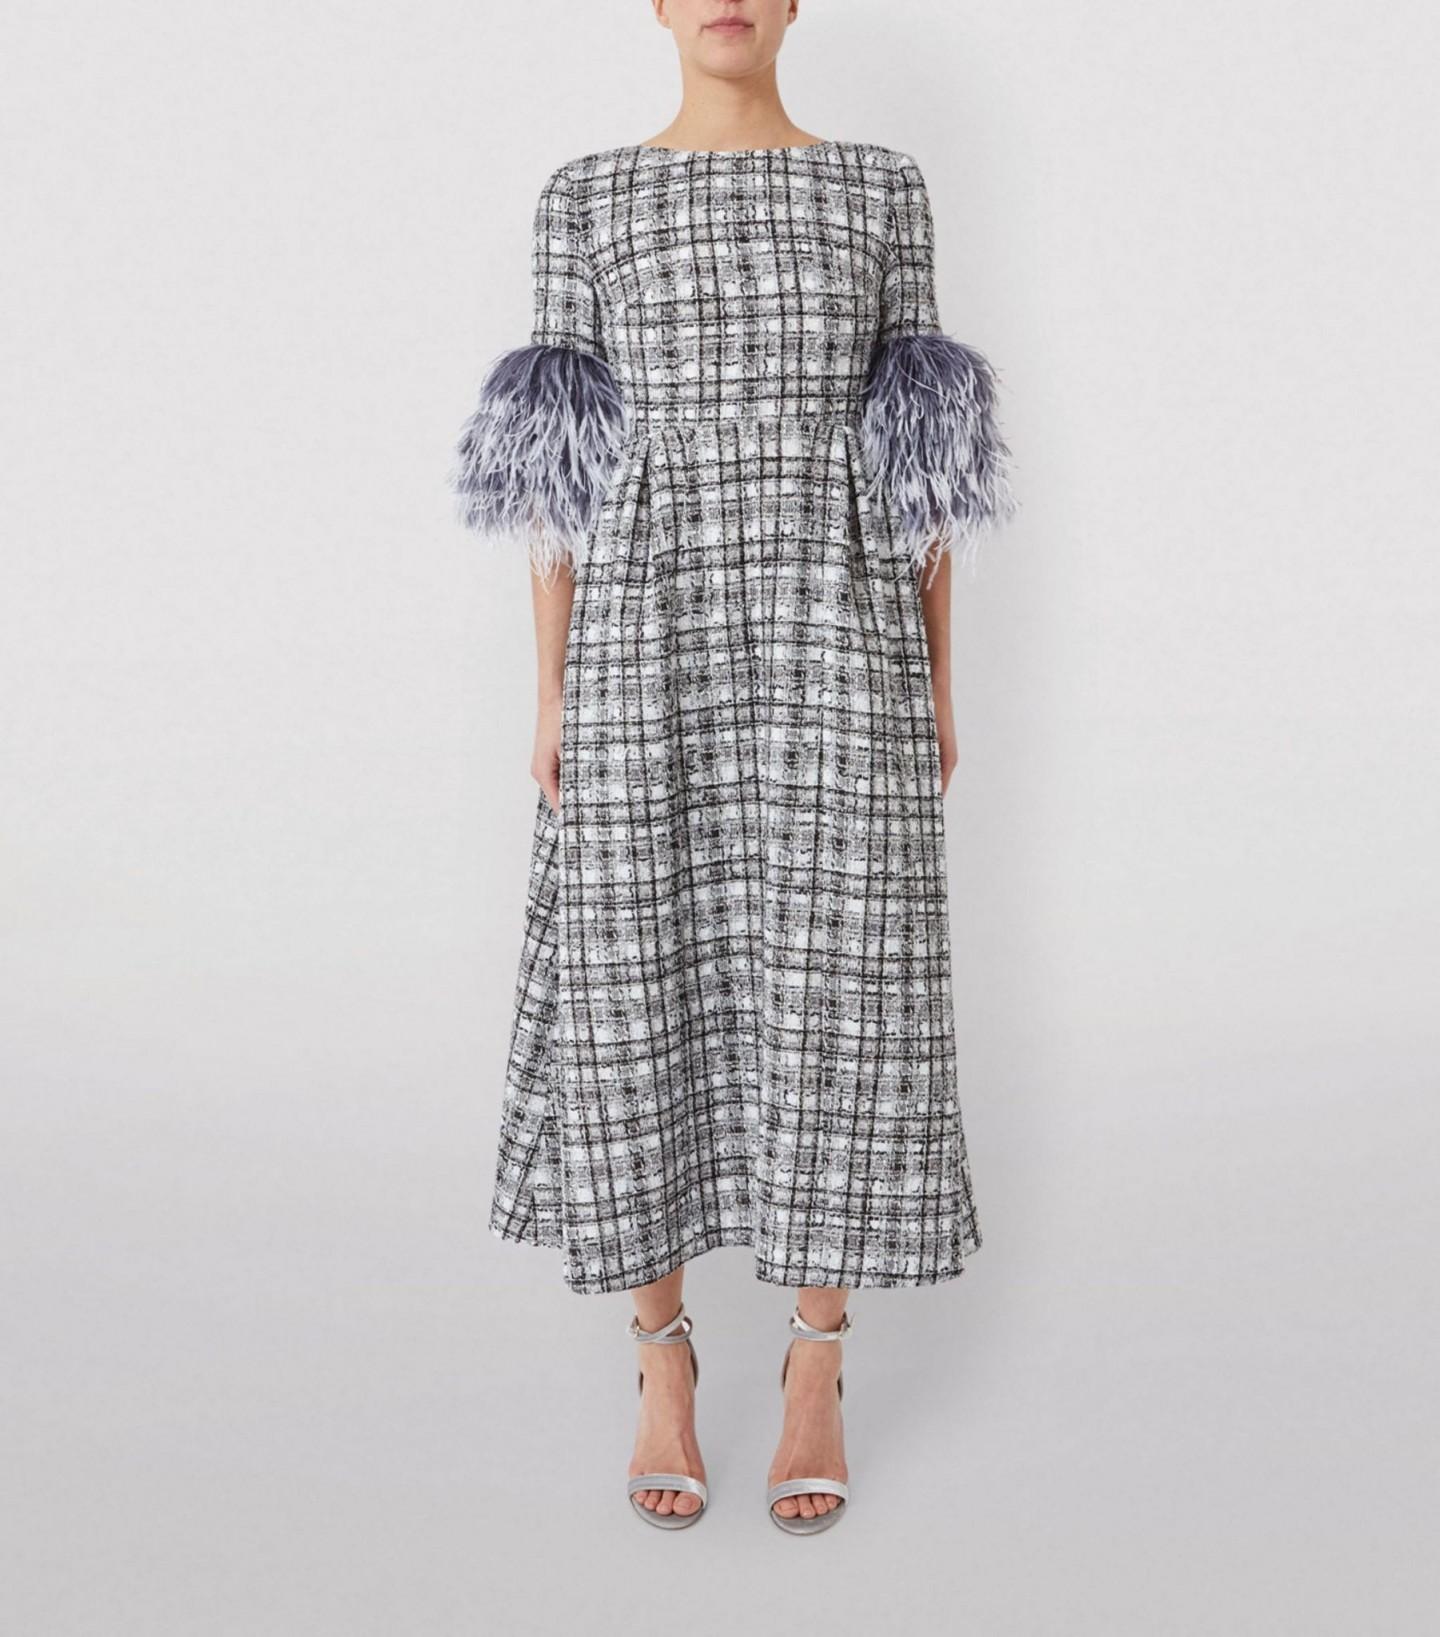 HUISHAN ZHANG Mariah Feather-Trim Plaid Dress